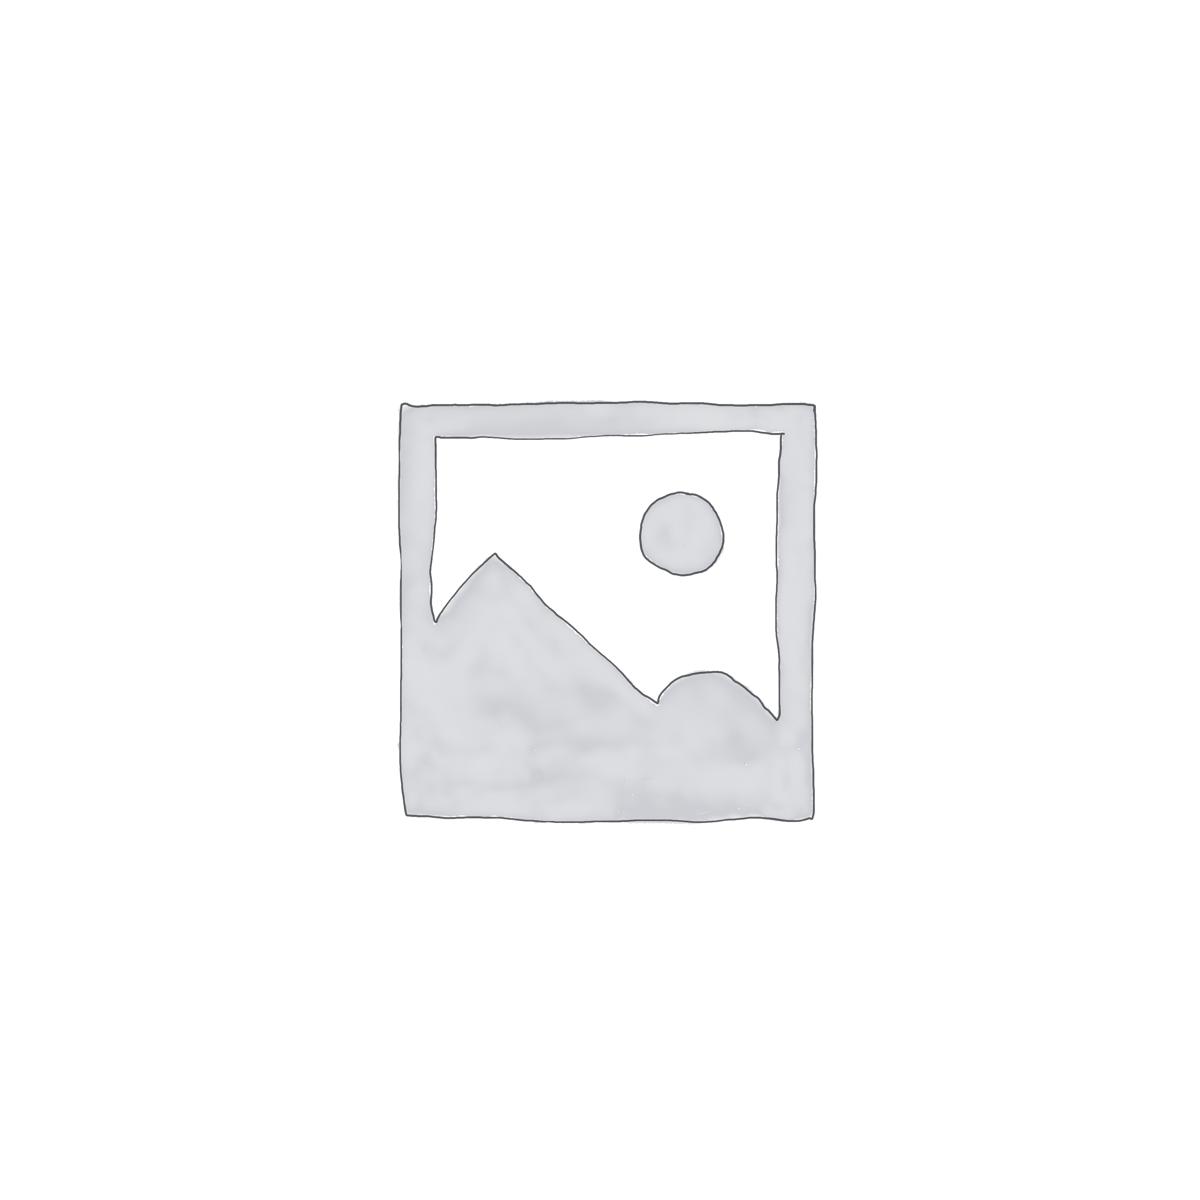 Borsoni/porta strumenti/tappetini/sacche ignifughe